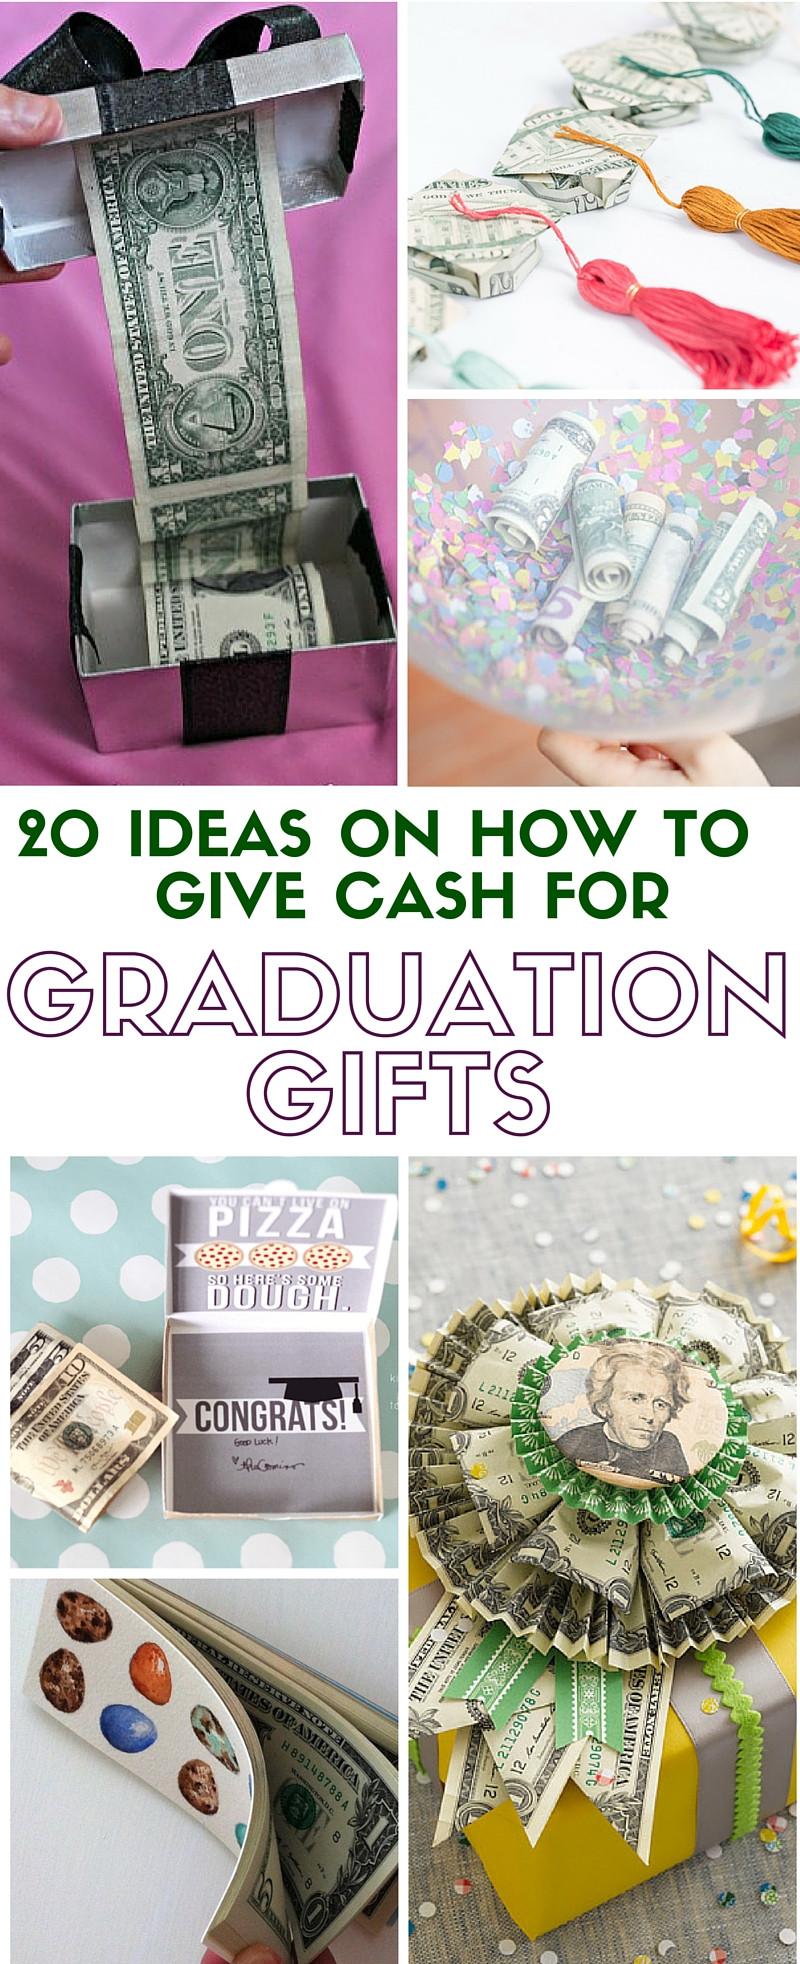 Graduation Day Gift Ideas  31 Back To School Teacher Gift Ideas The Crafty Blog Stalker